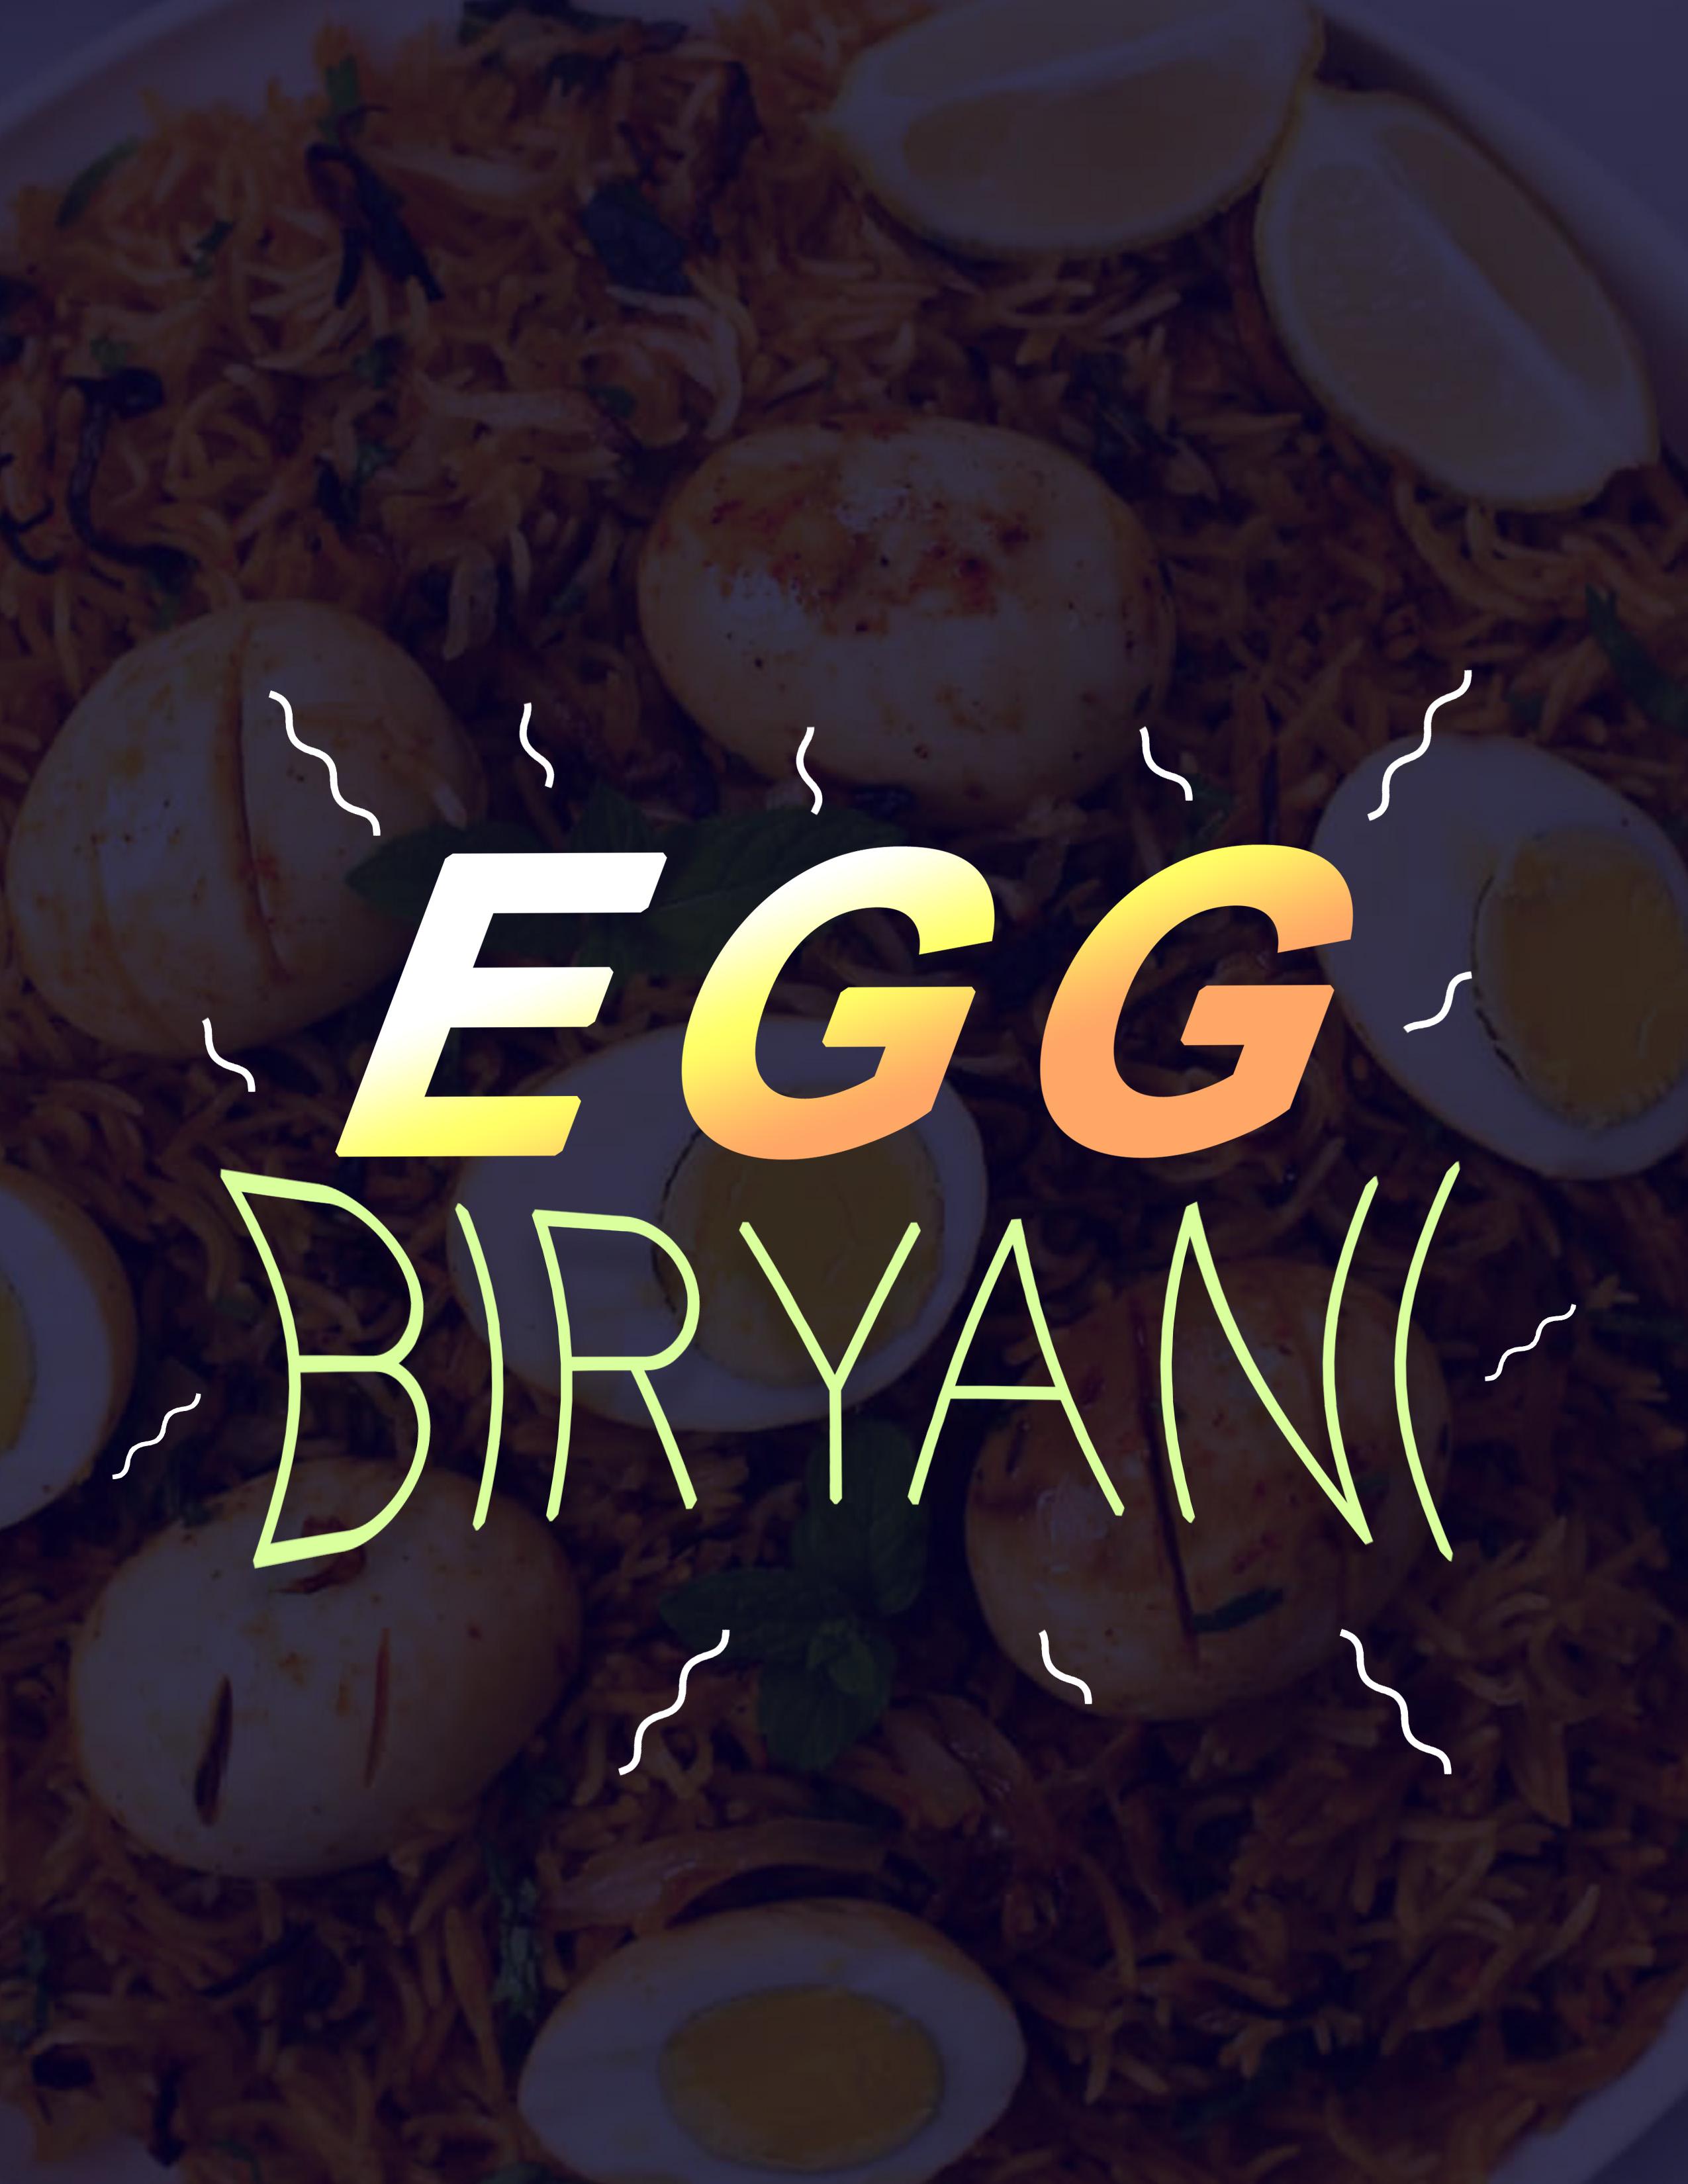 Egg biriyani flyer